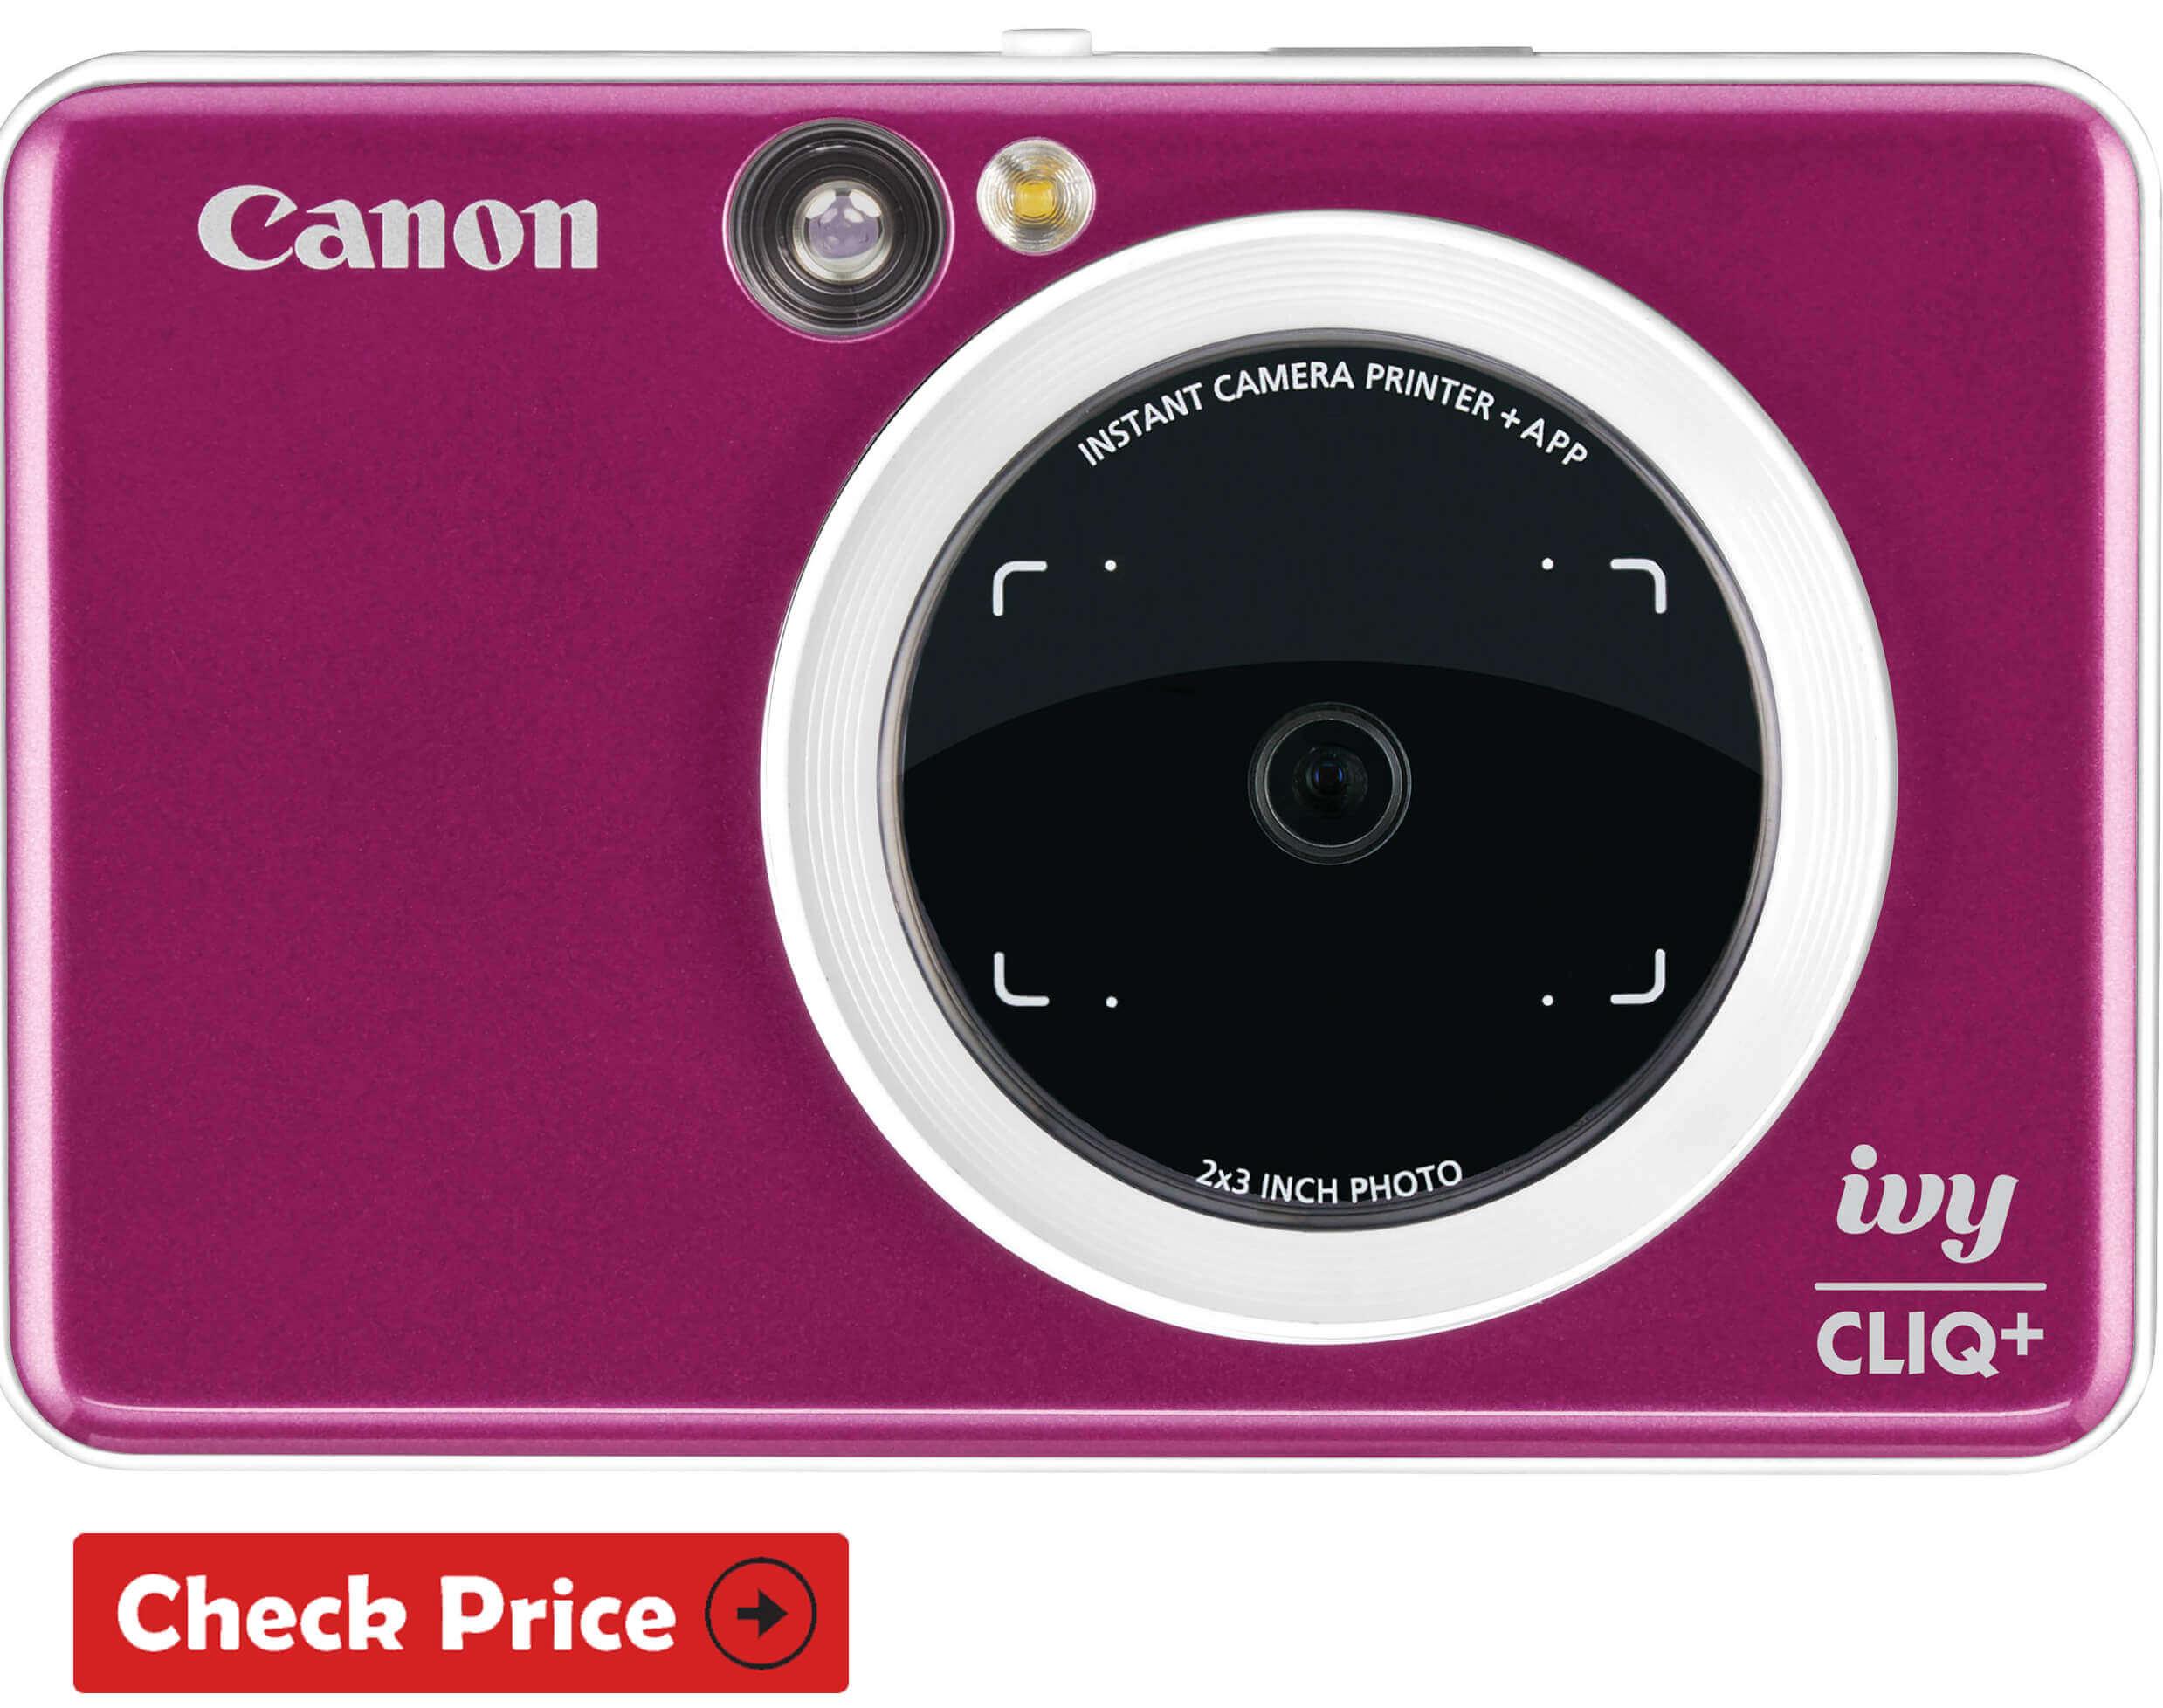 Canon - Ivy Cliq camera for black friday deals